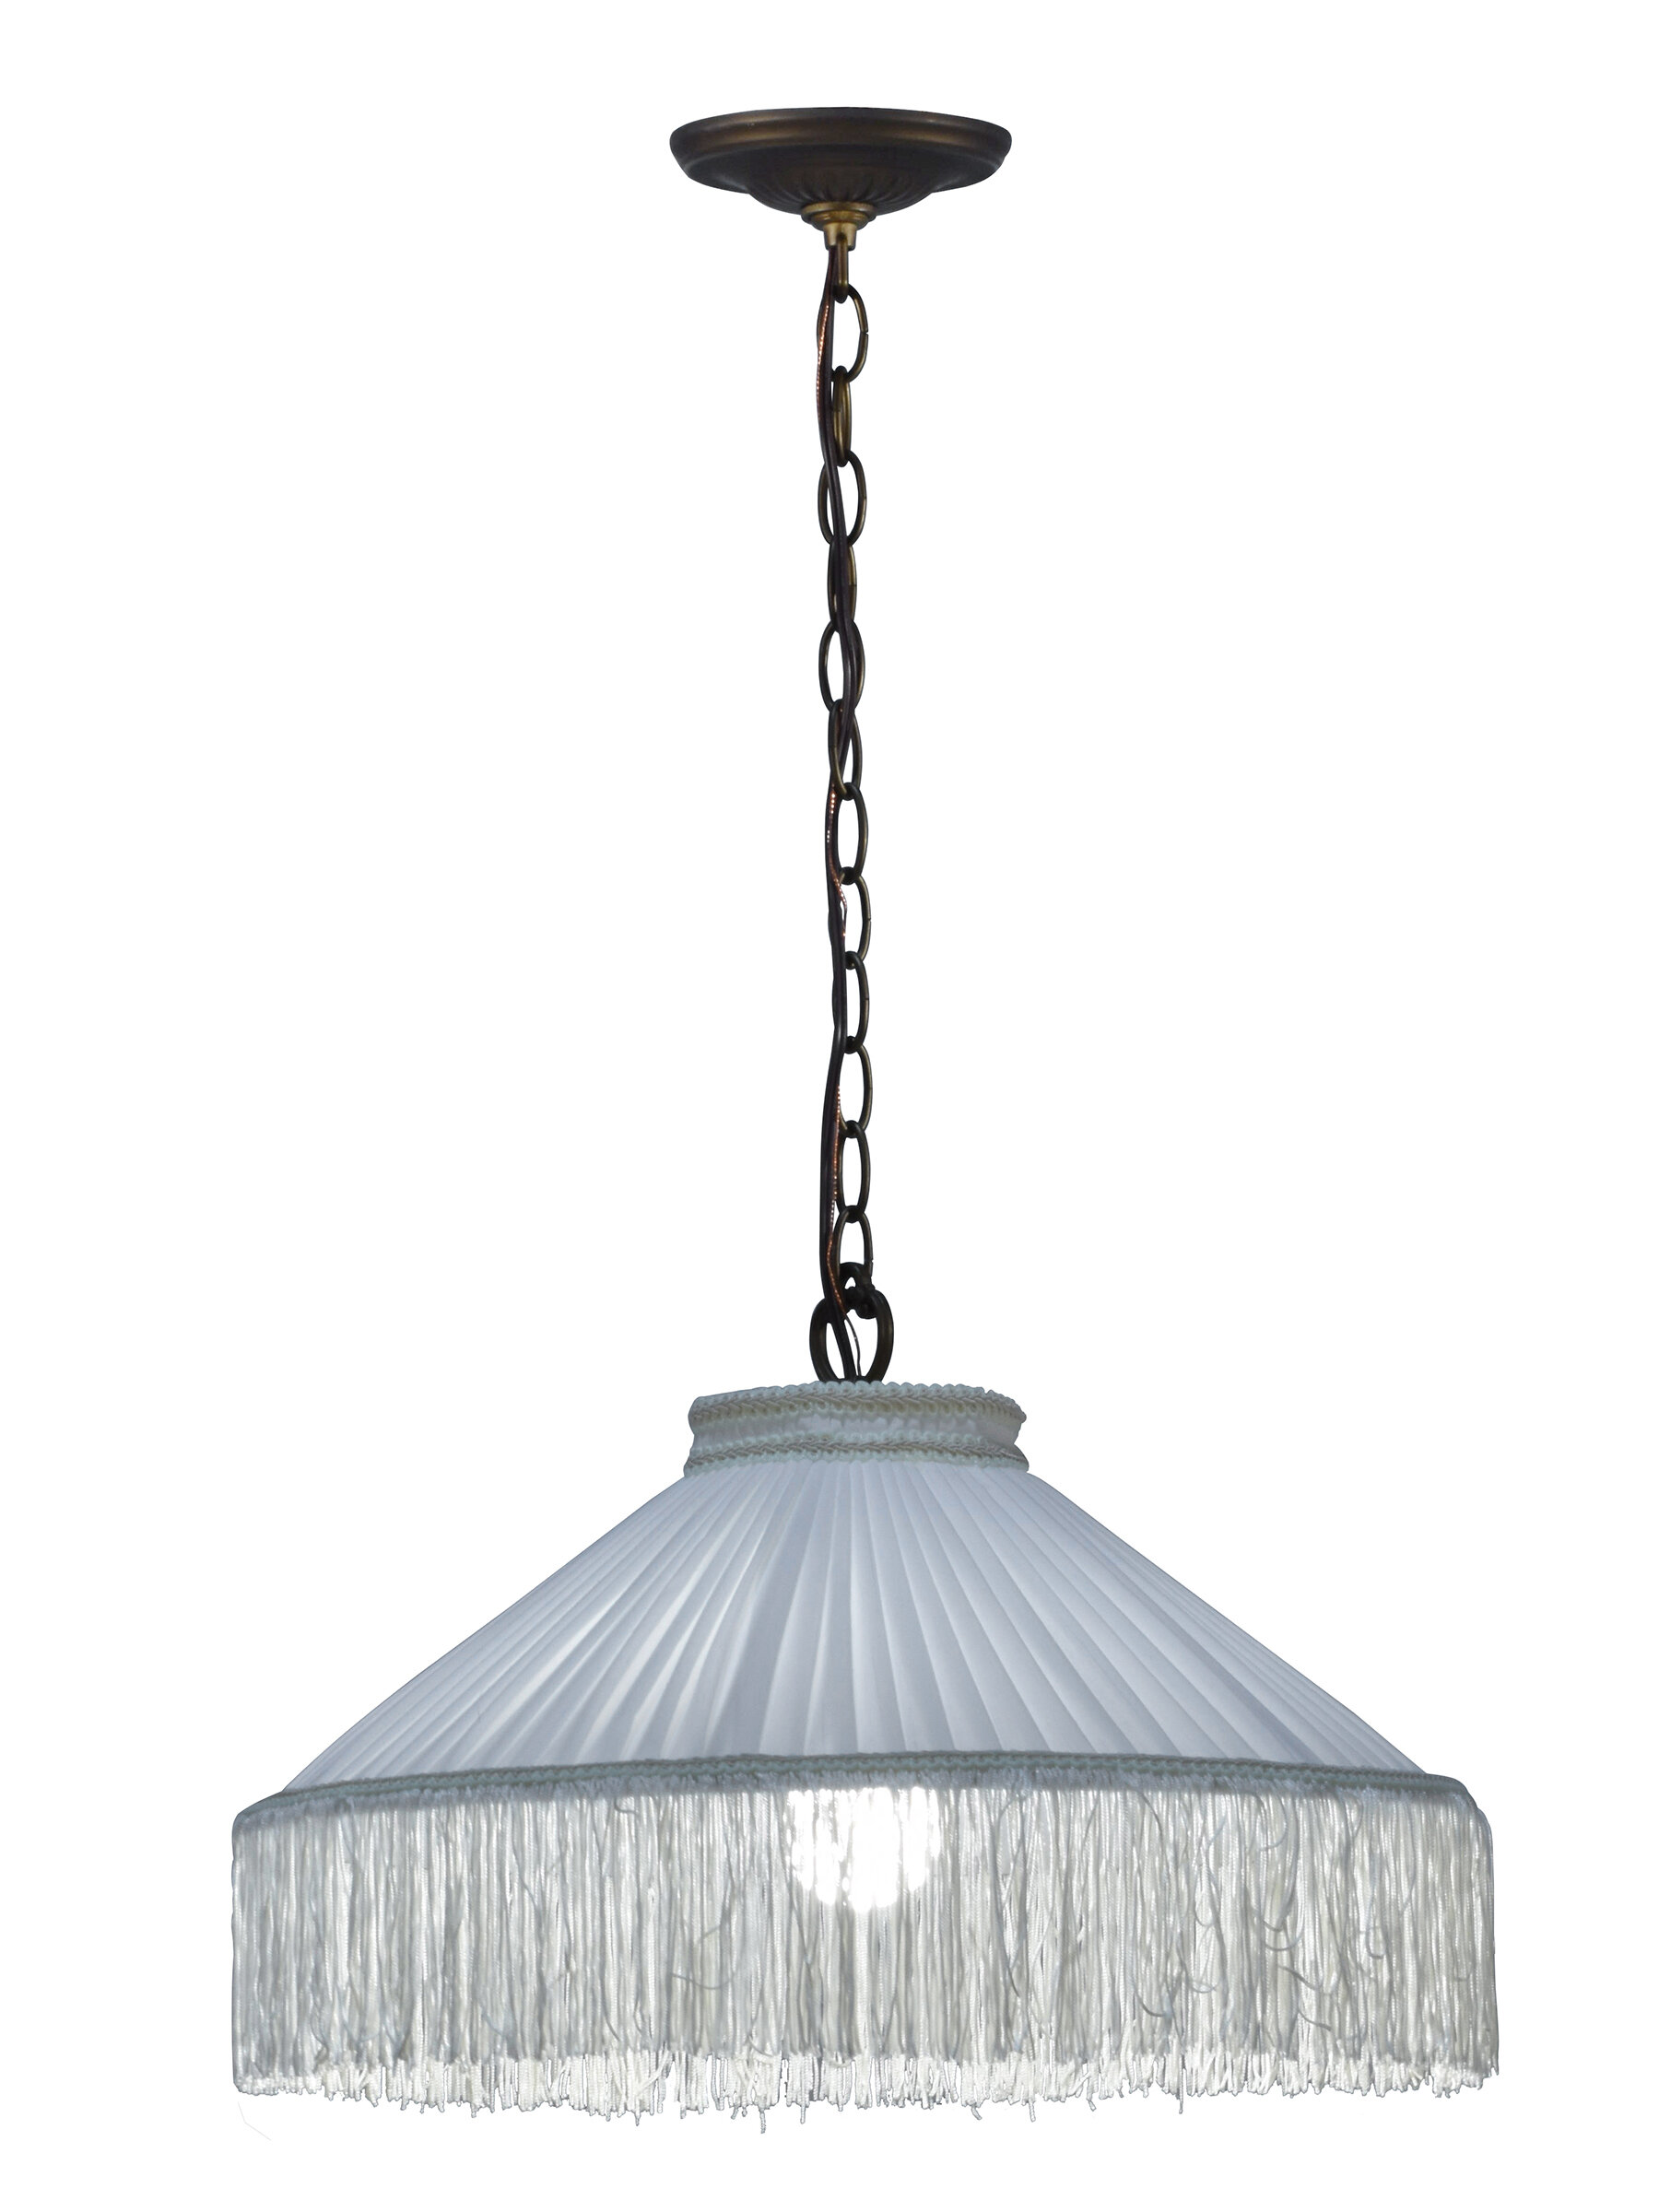 Astoria Grand Mcnair 1 Light Single Dome Pendant With Beaded Accents Wayfair